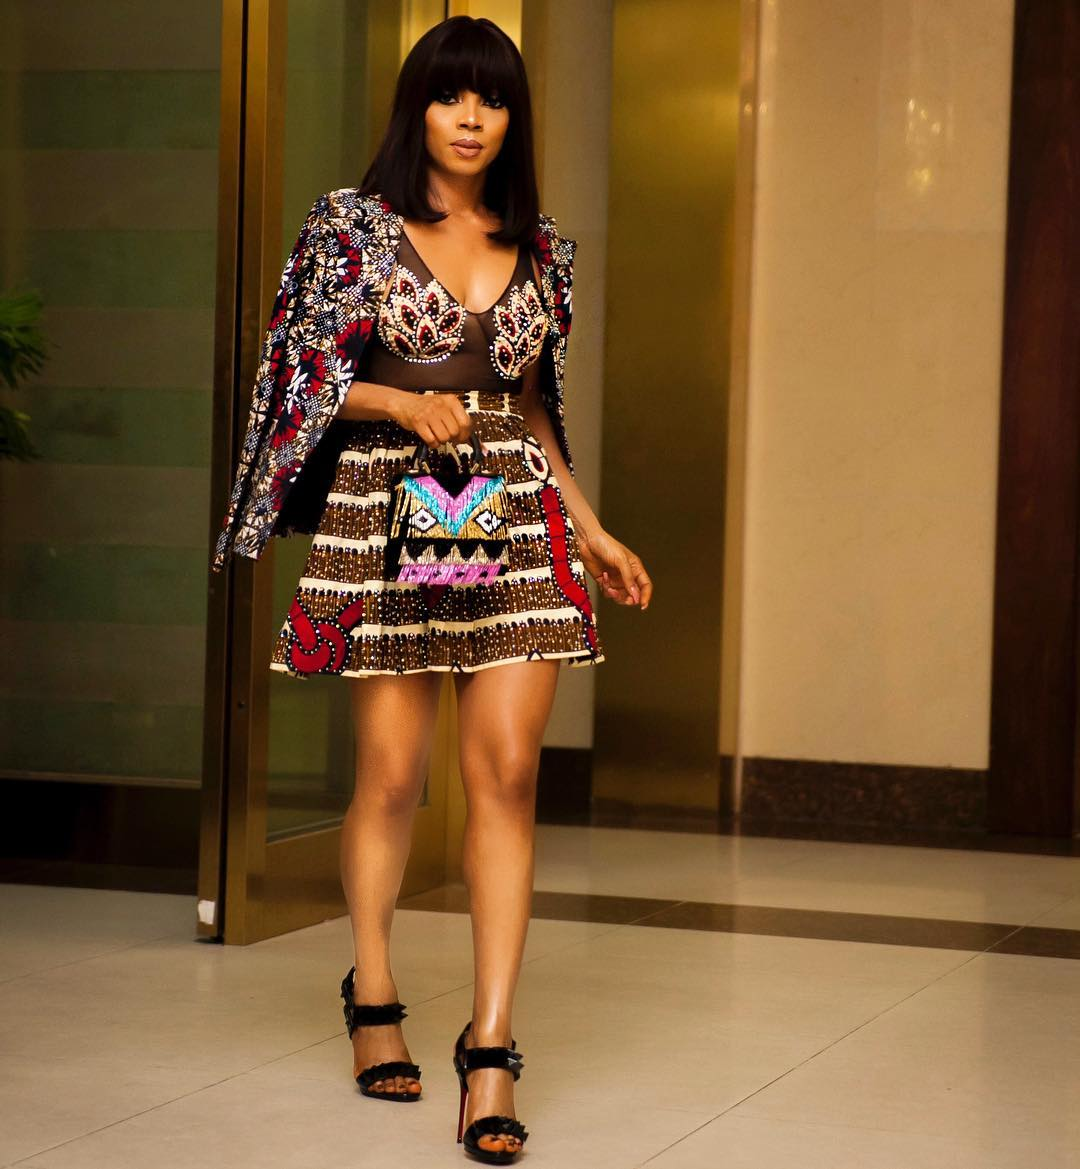 toke-makinwa-on-becoming-fashionpolicenigeria-2